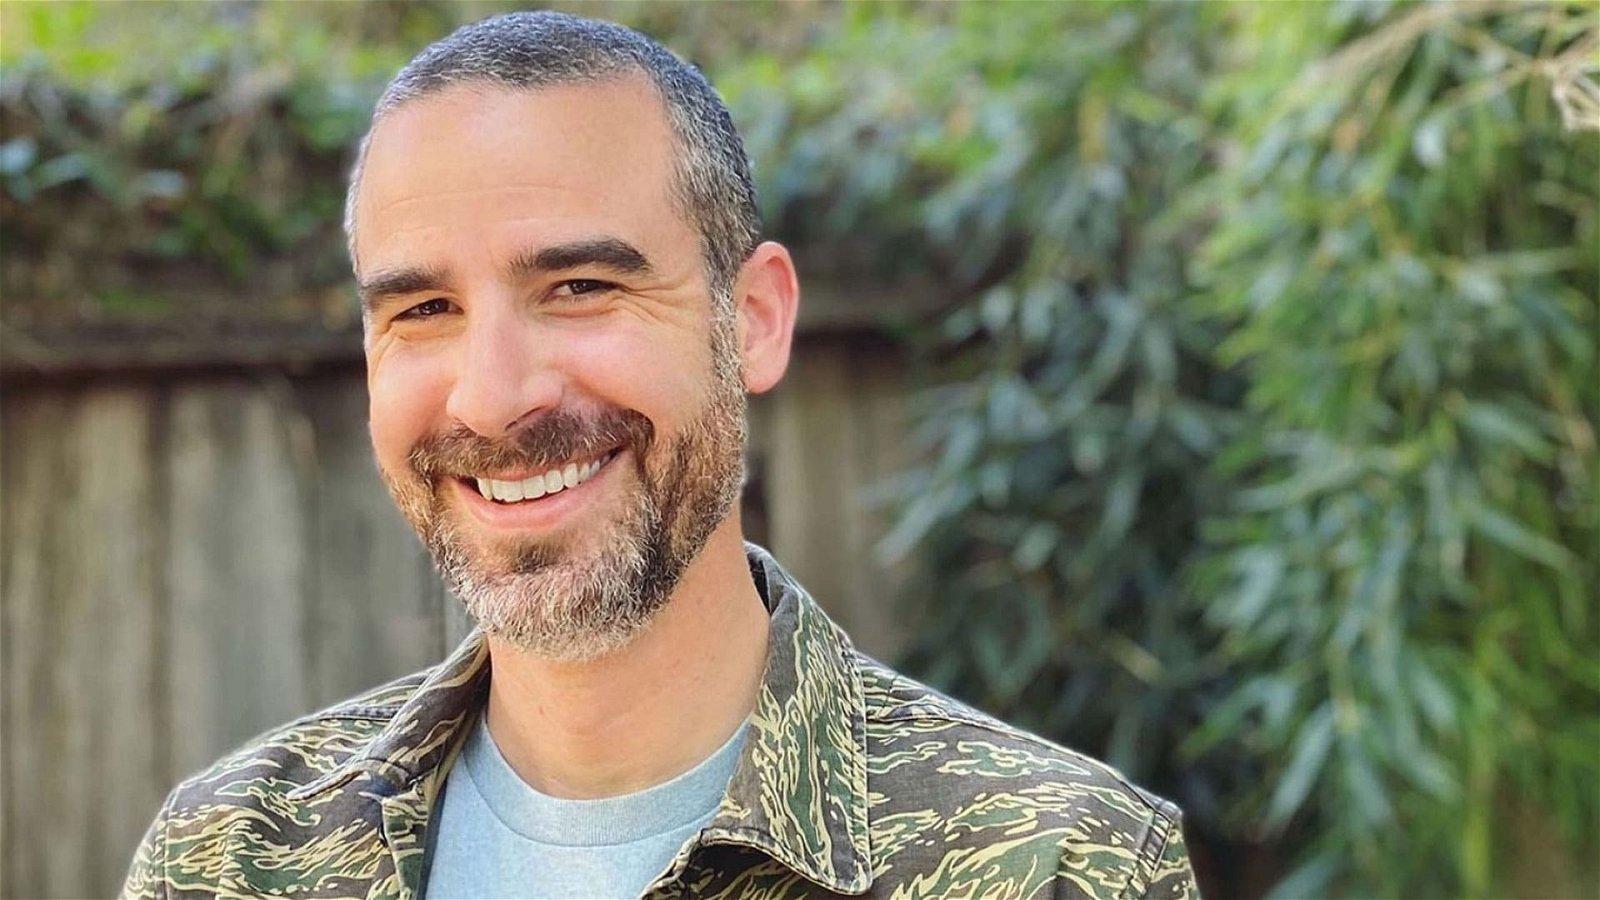 Nathan Vella, Co-Founder of Capybara Games Joins Annapurna Interactive